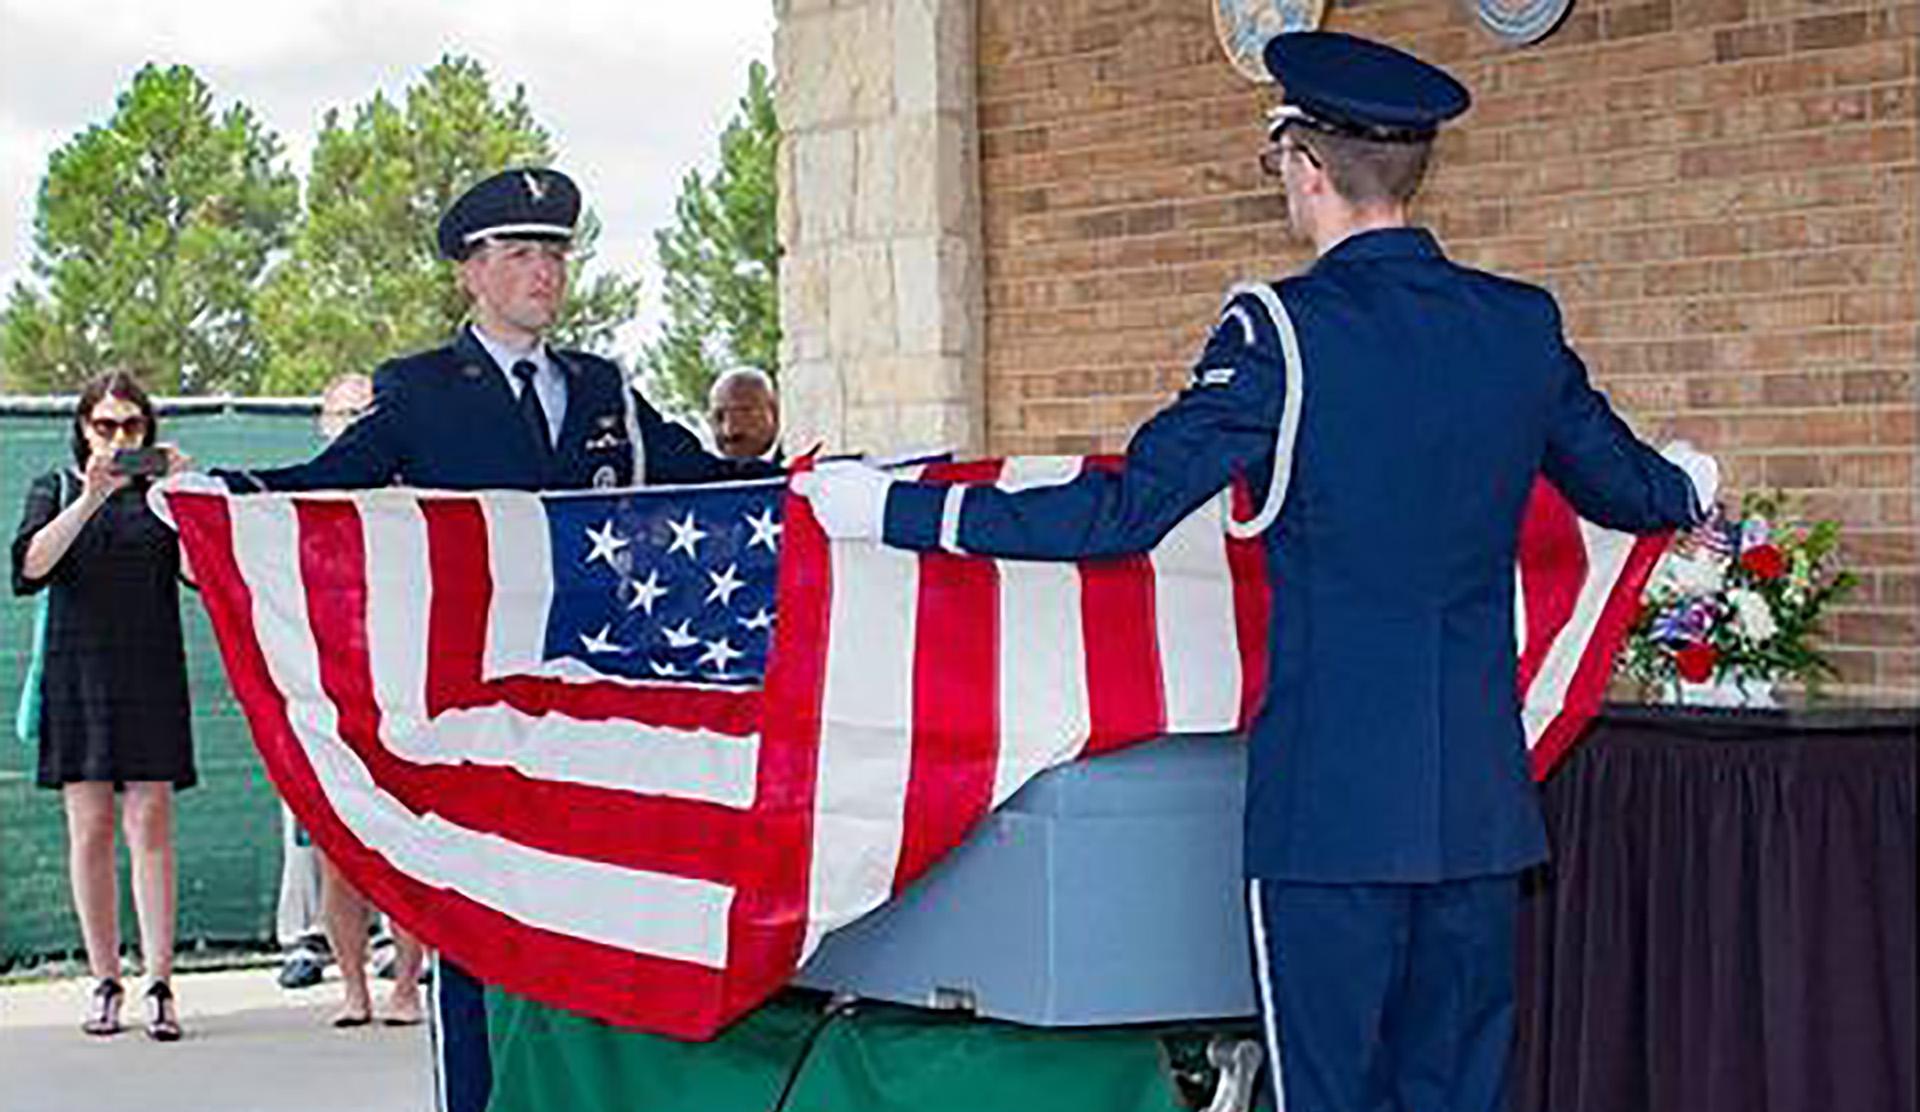 Veteran's casket at funeral service.jpg